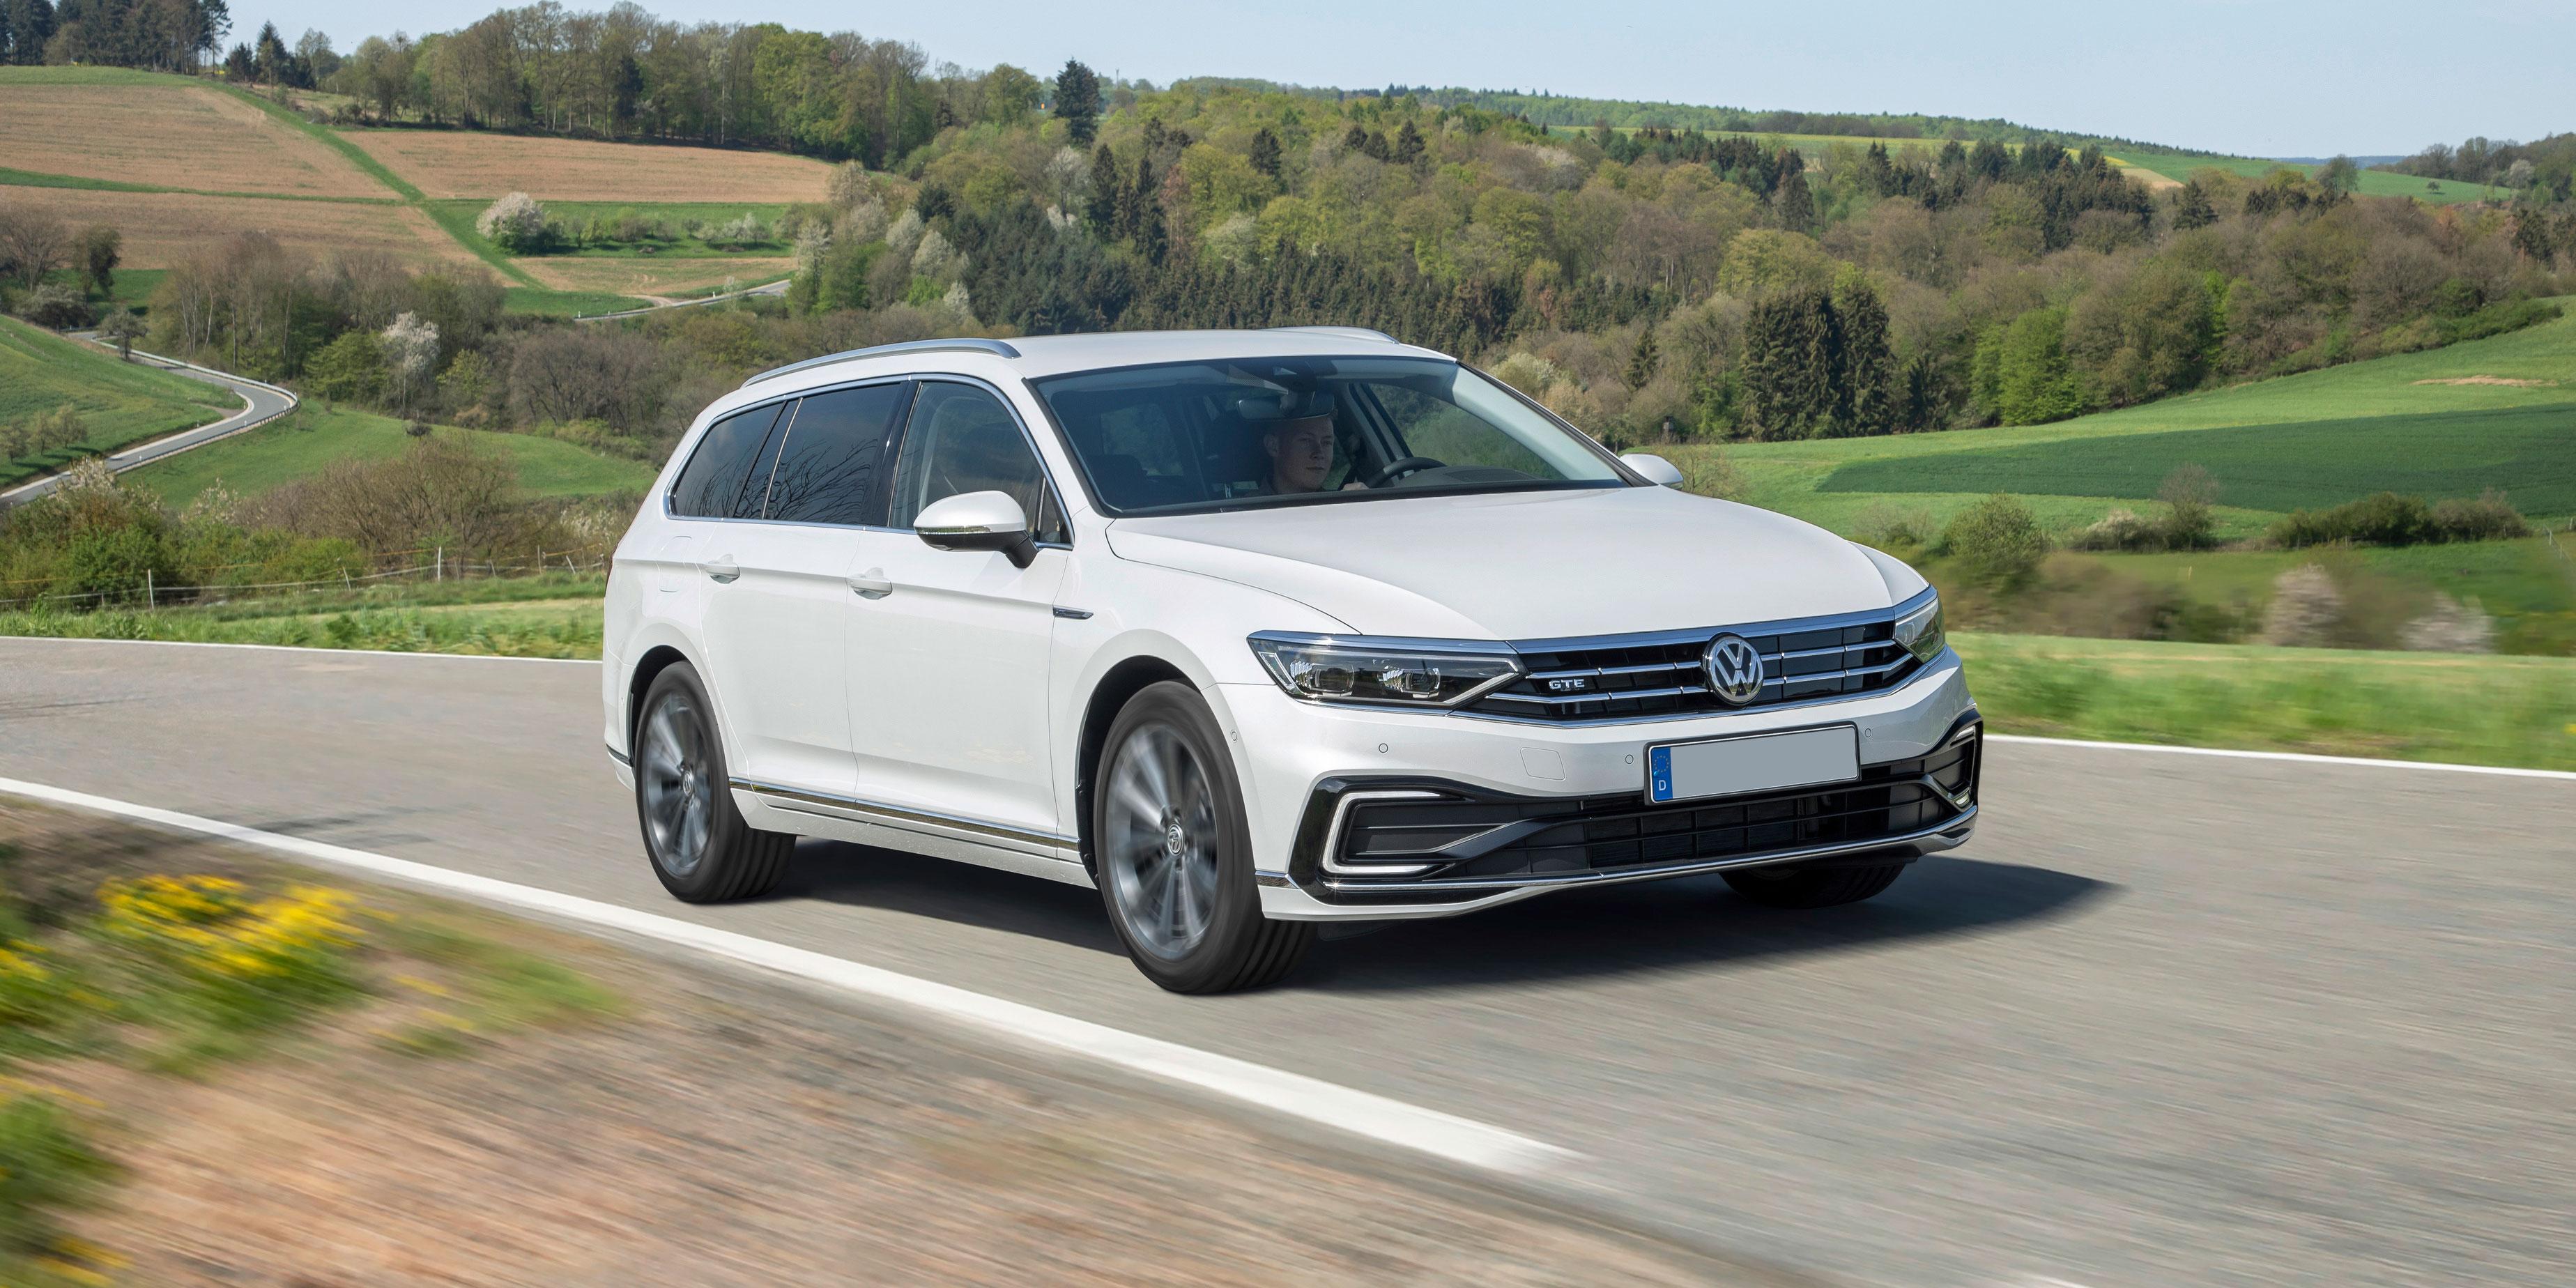 Volkswagen Passat Gte Estate Specifications Prices Carwow